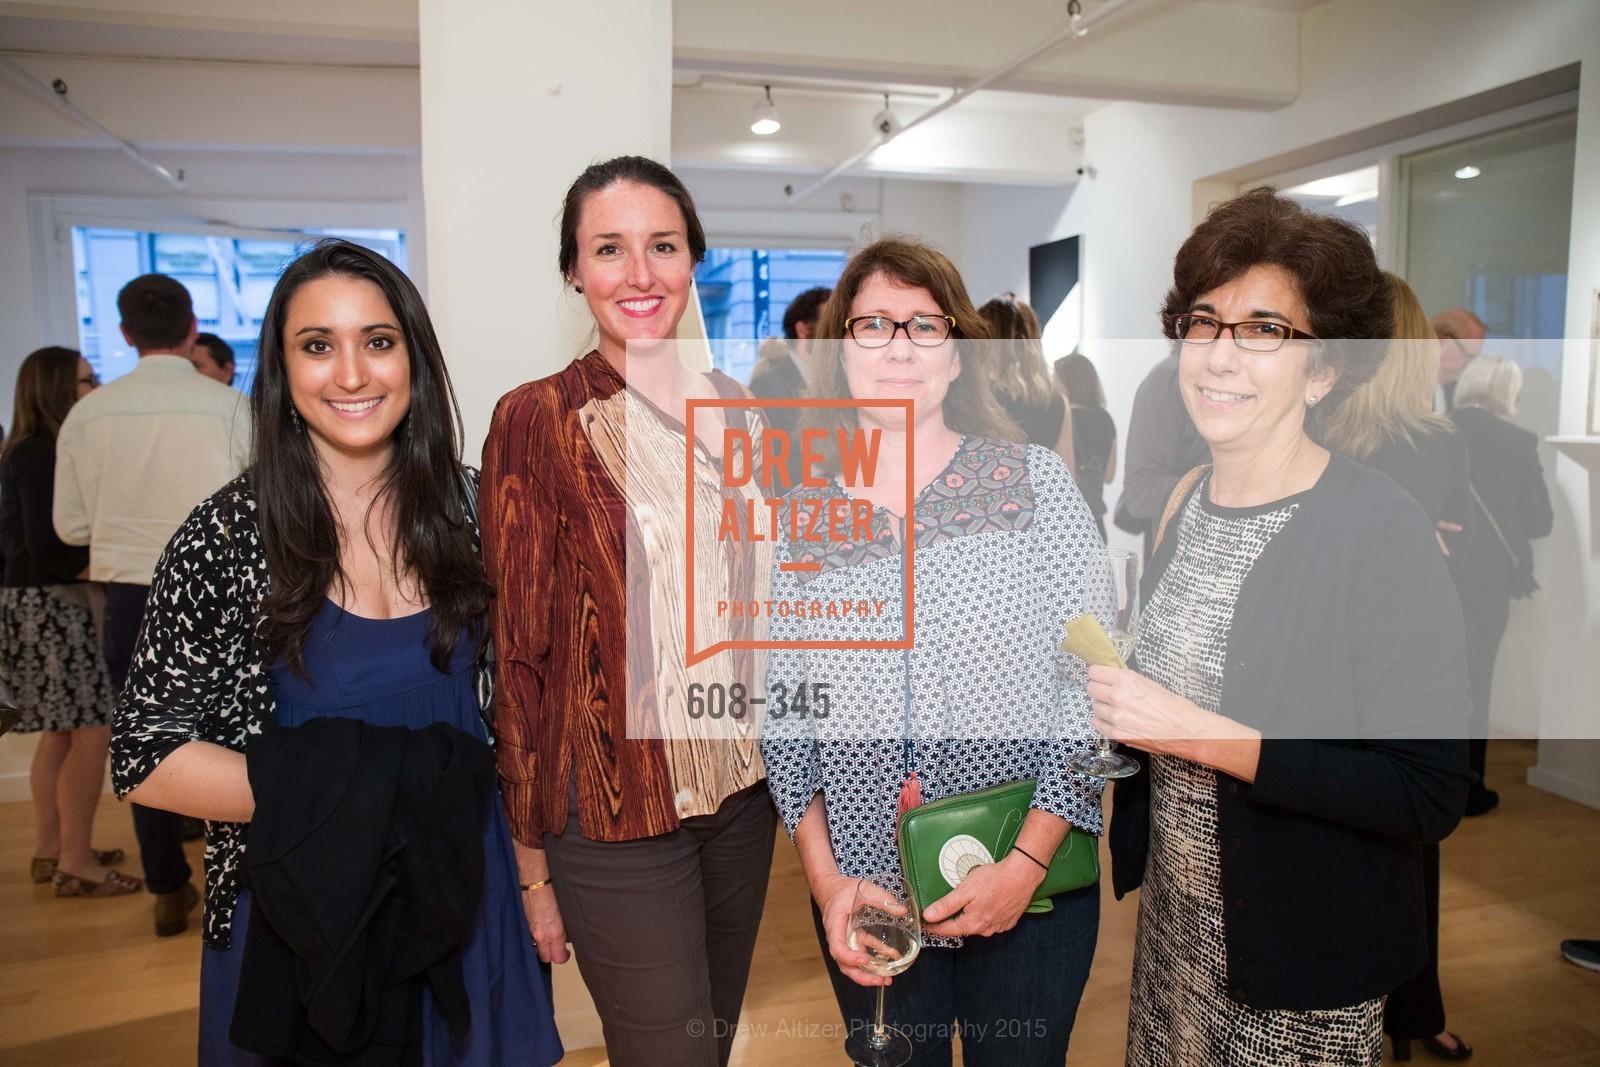 Mikael Kalfayan, Sarah Nelson, Brooke Corley, John Berggruen Gallery presents